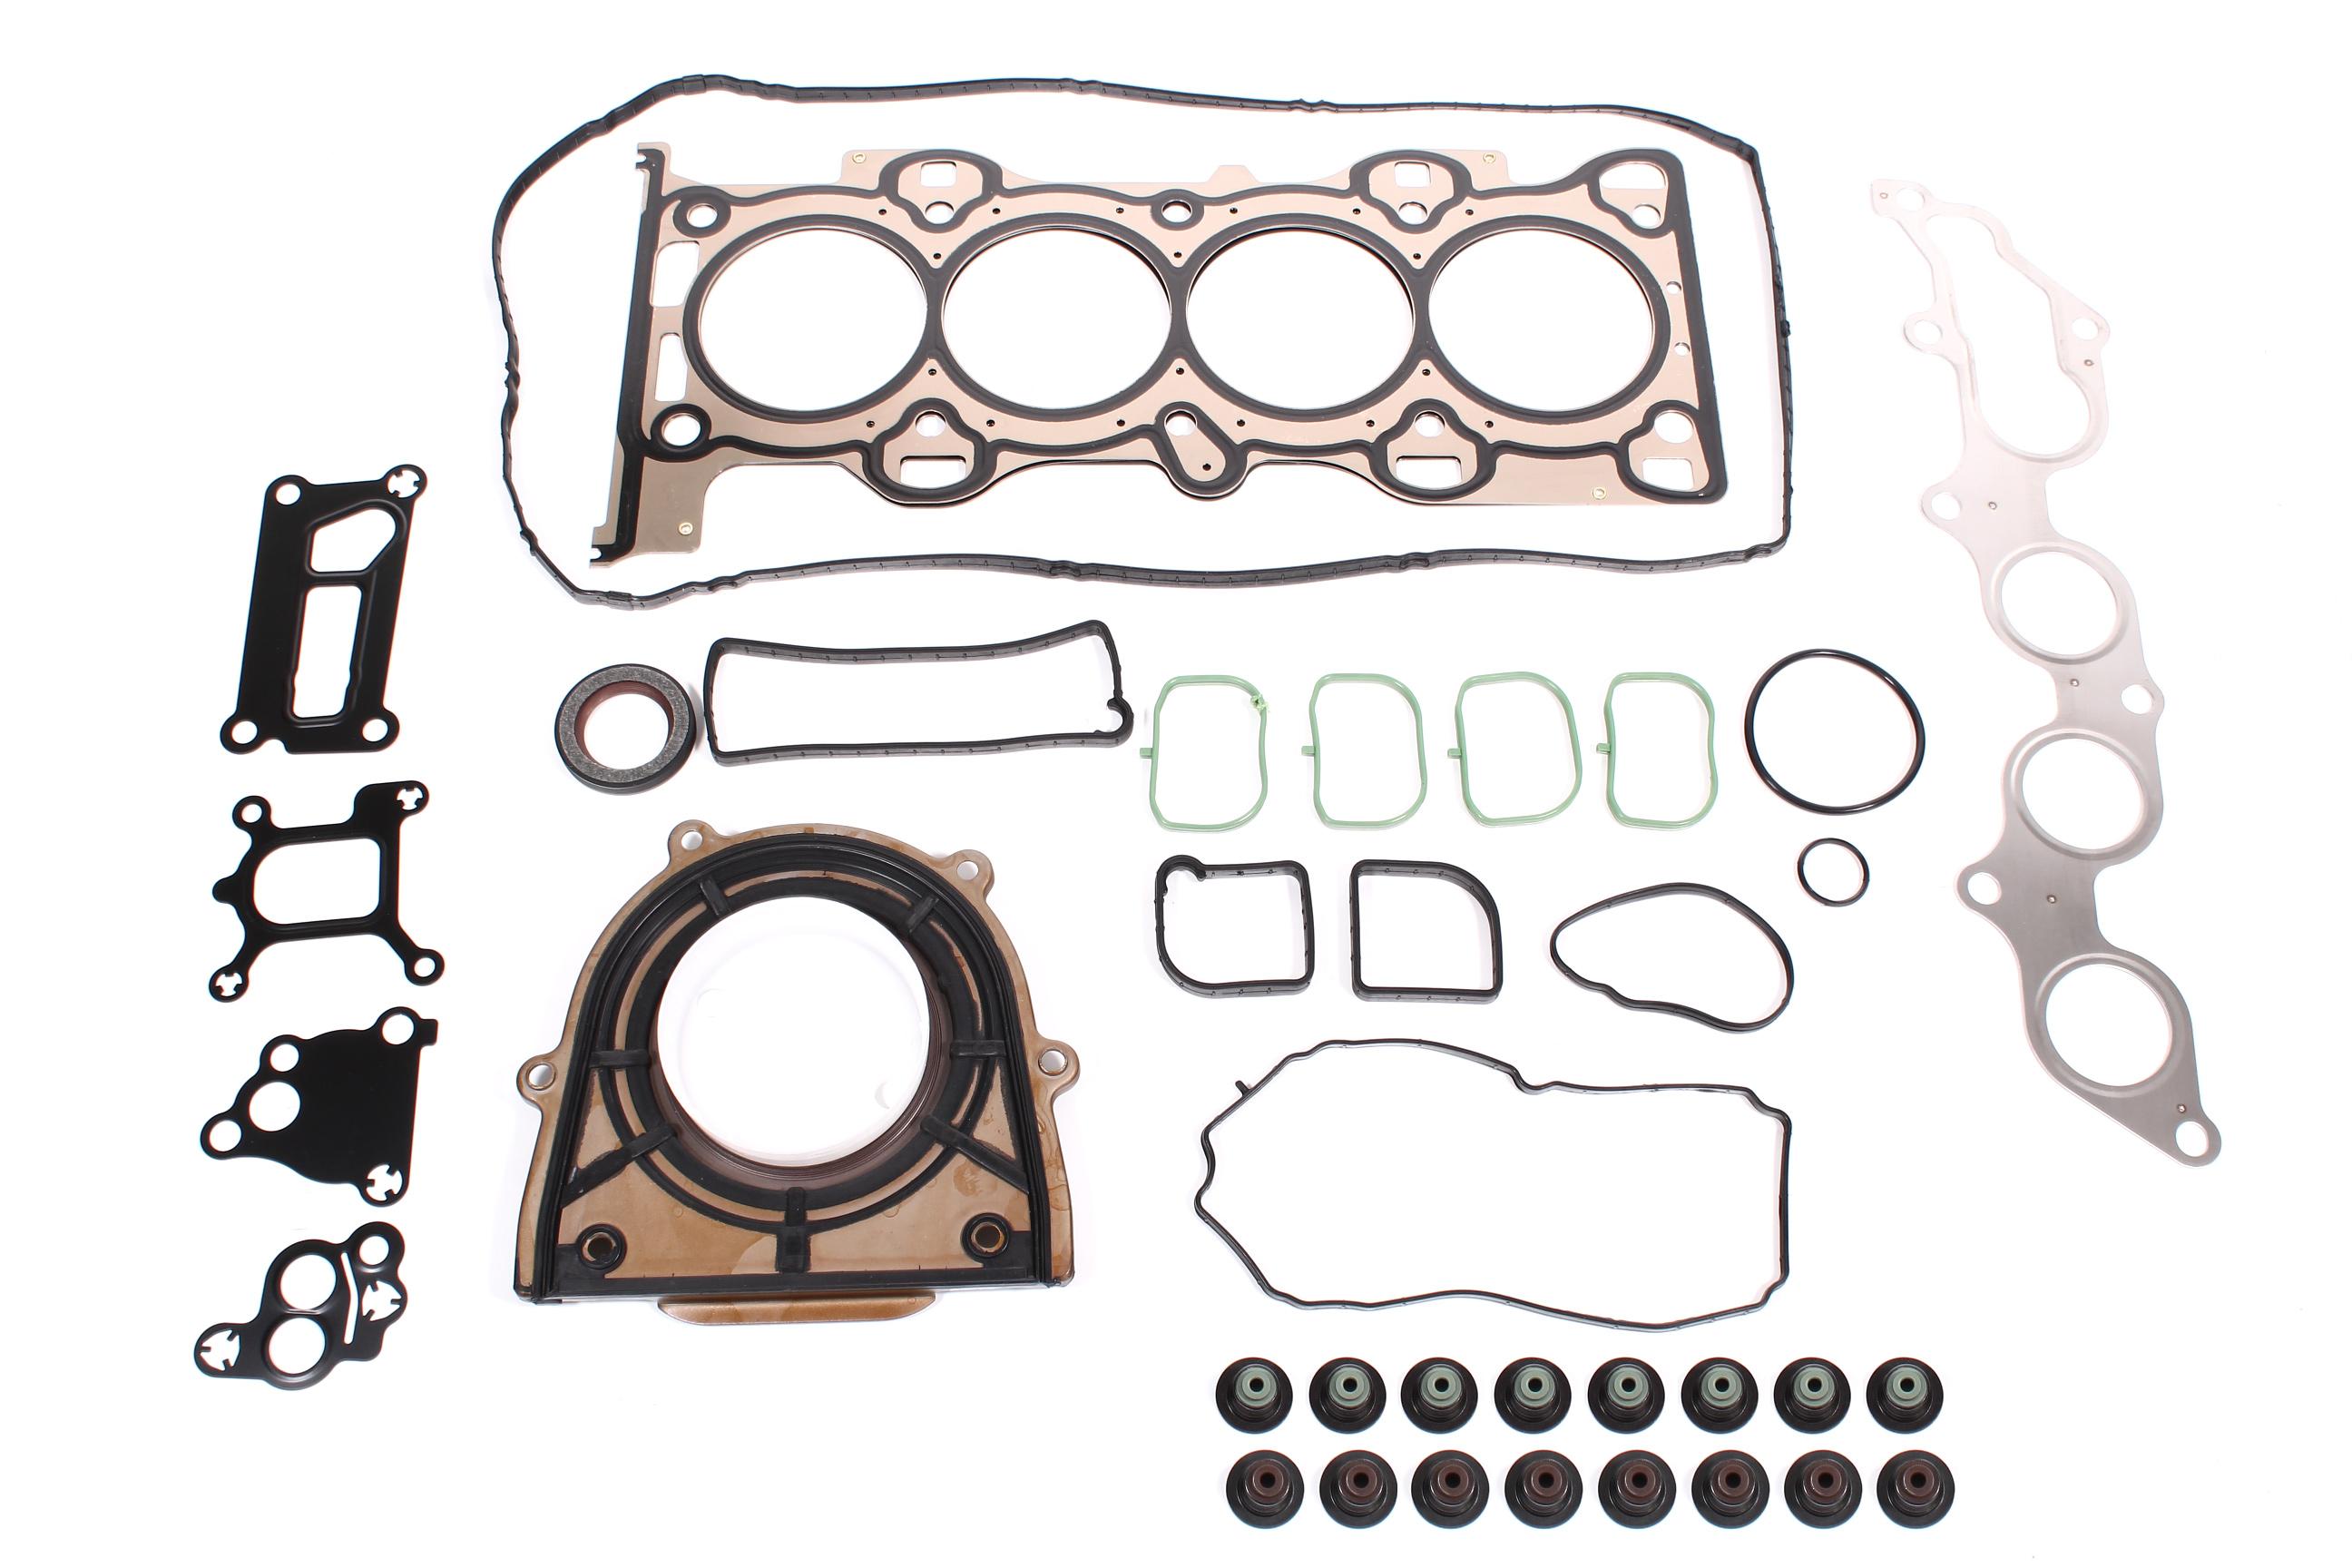 Dichtungssatz Zylinderkofpdichtung Ford Ecosport 2,0 16V SYDA 8LB0-10-271 NEU